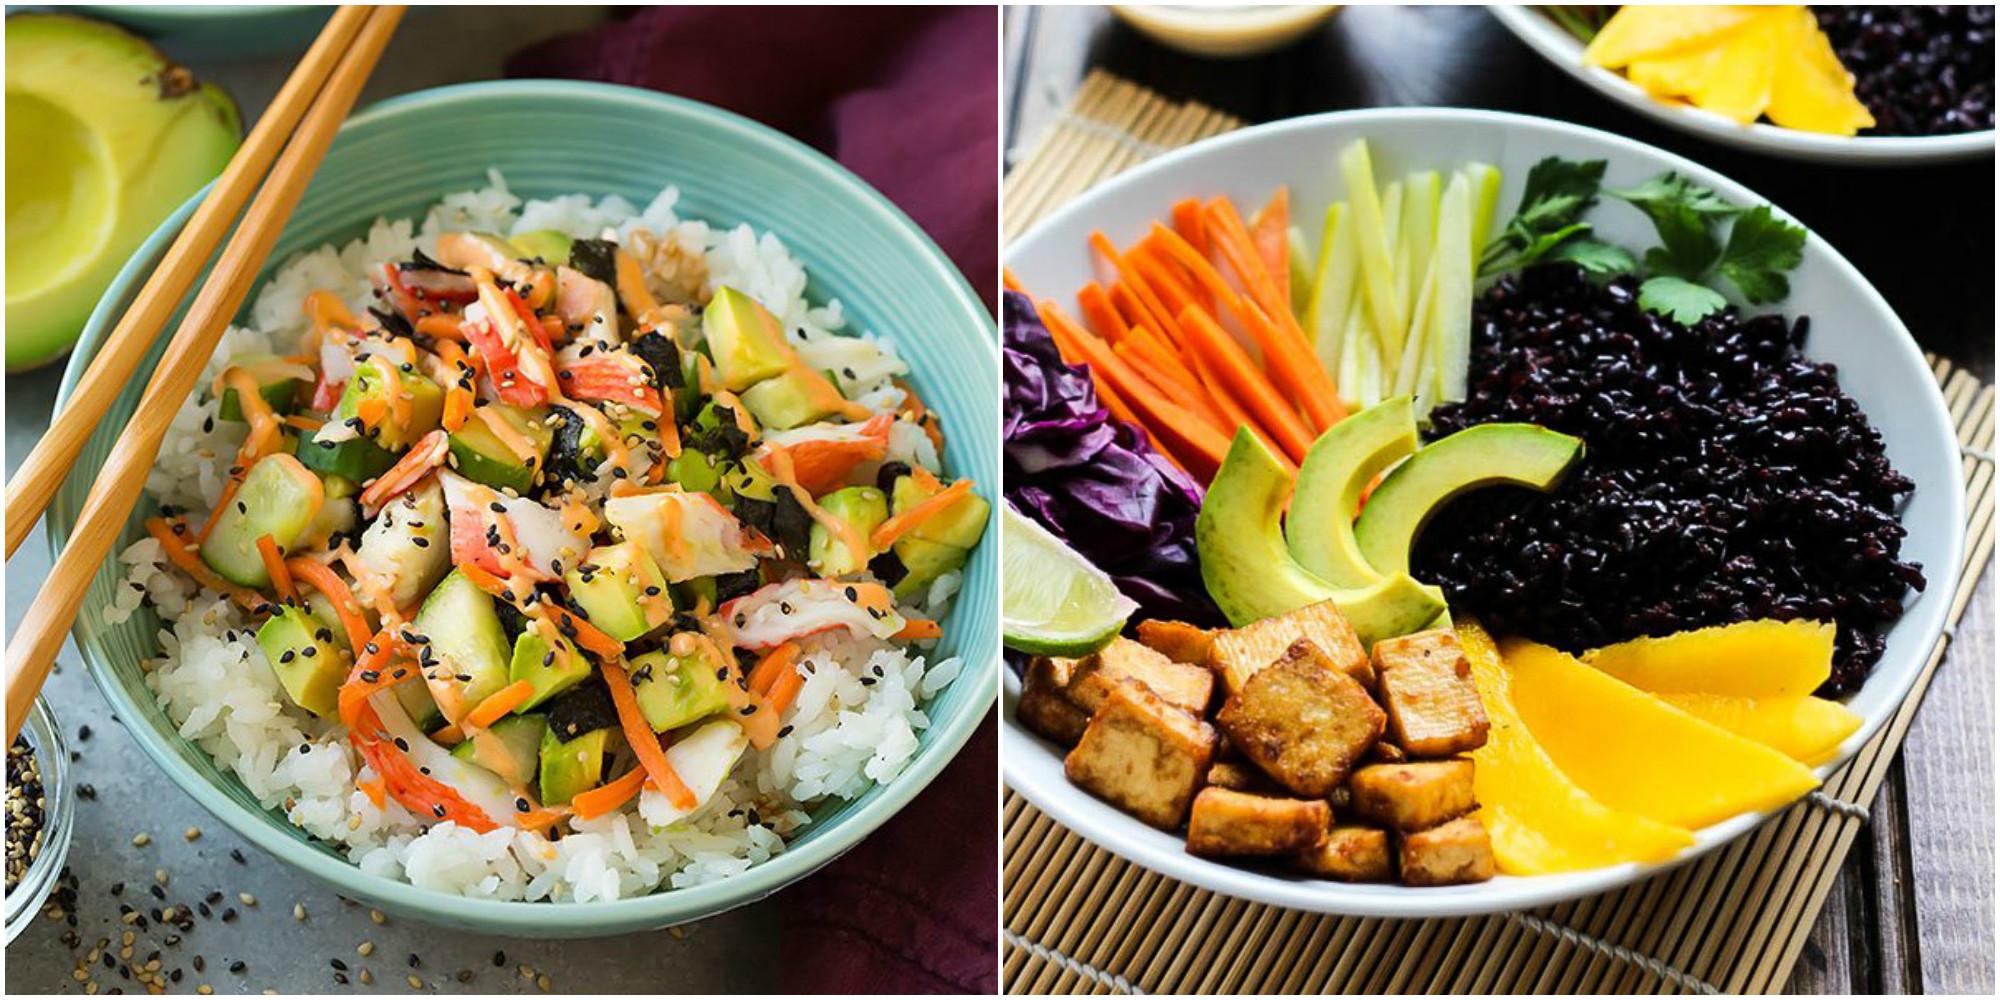 Healthy Rice Bowl Recipes  25 Easy Rice Bowl Recipes How to Make Healthy Rice Bowls